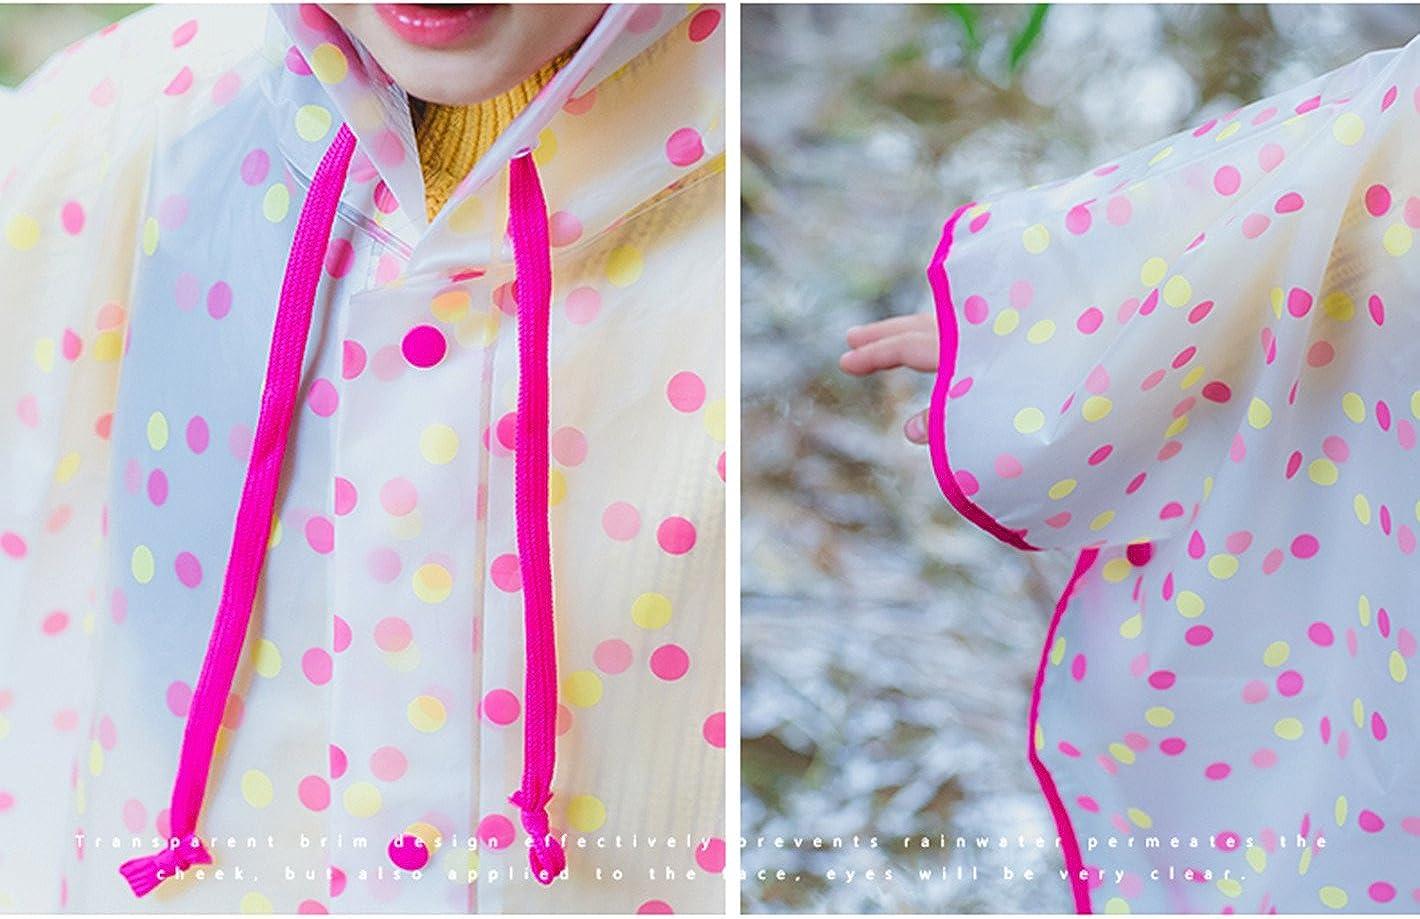 SWIHELP Kinder Regenmantel Regenponcho Regenjacke mit Kapuze Wasserdicht Regenponcho Unisex Wasserdicht Atmungsaktiv Regenmantel